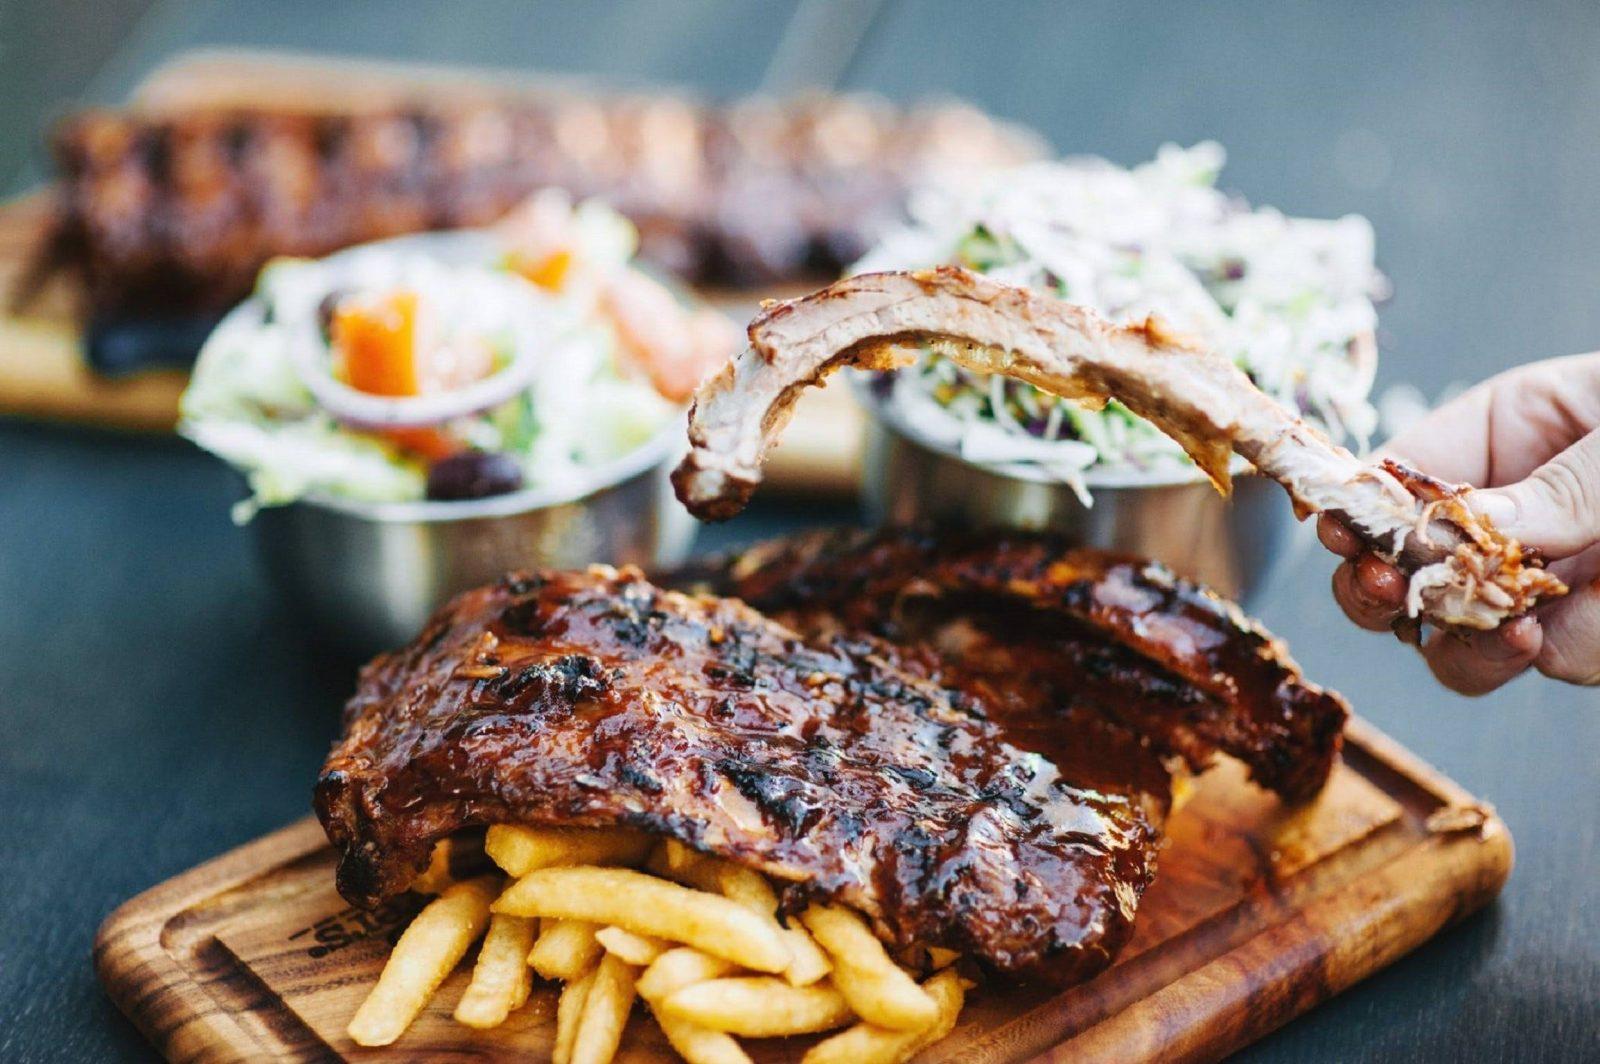 Ribs and Burgers on William Street, Perth, Western Australia